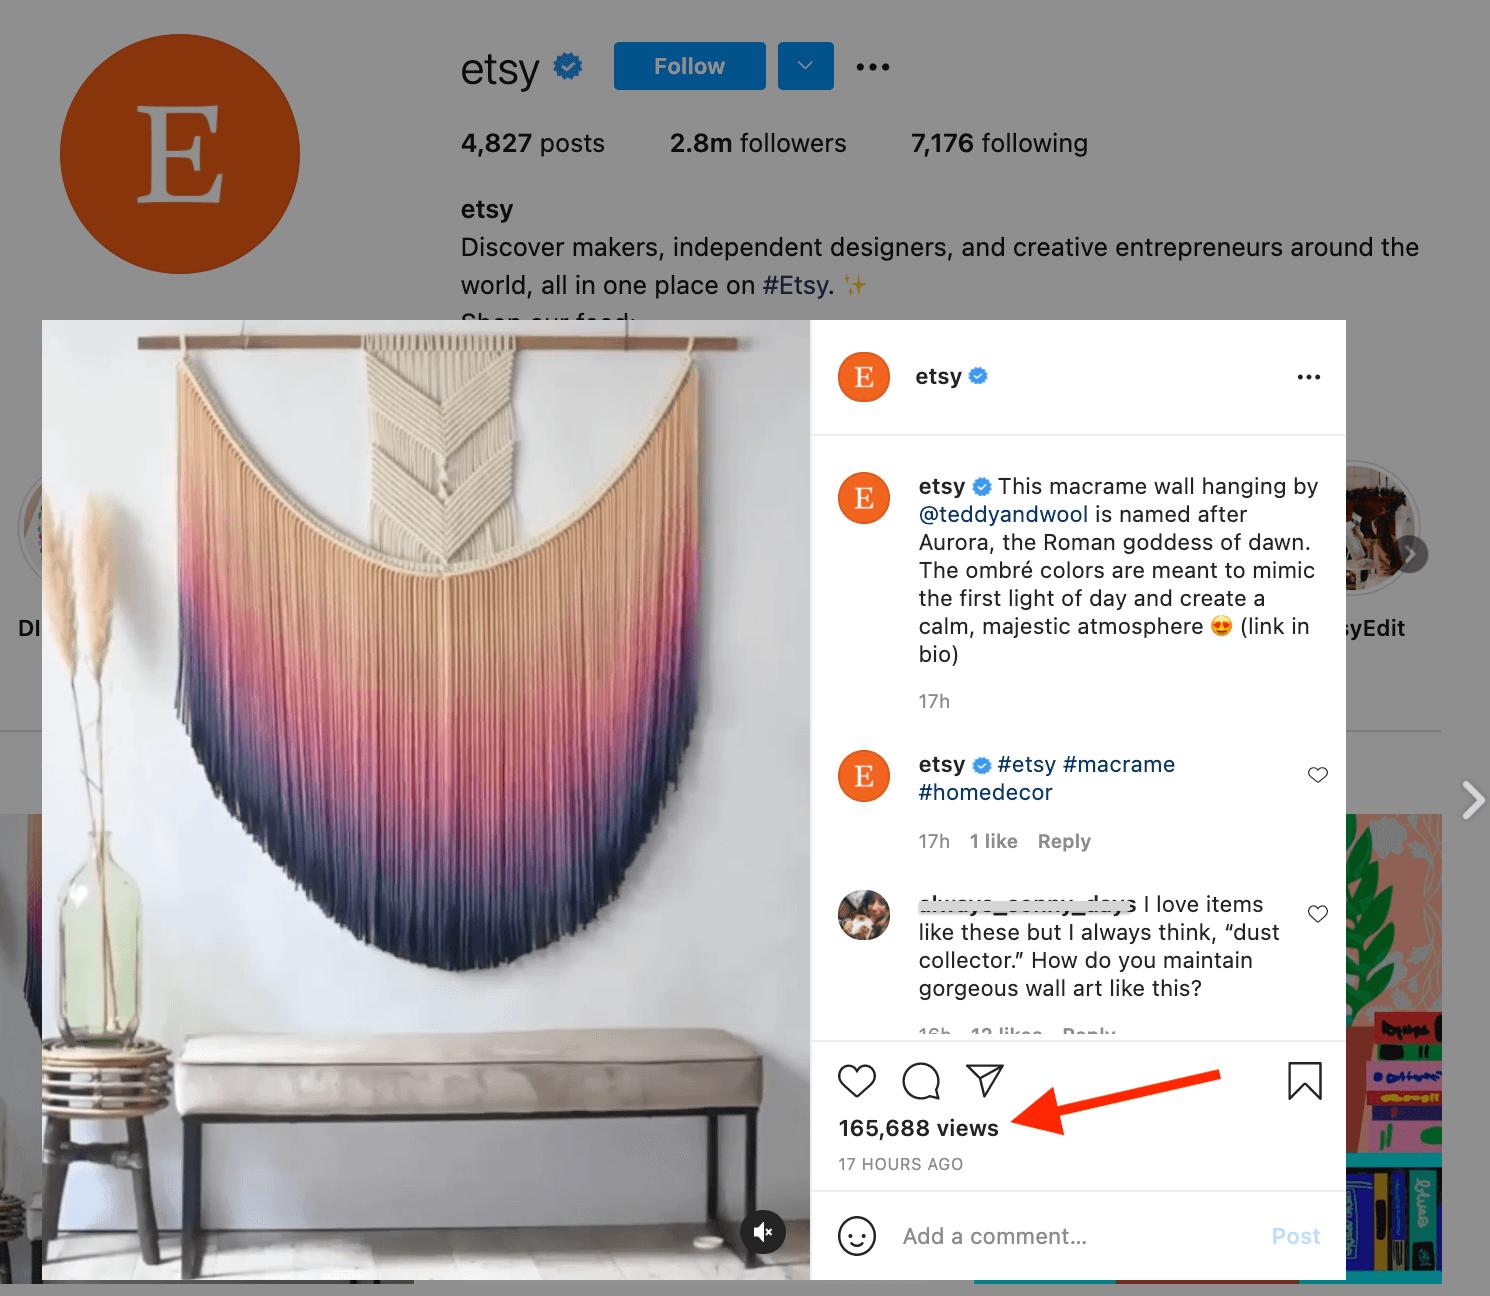 Etsy's instagram post